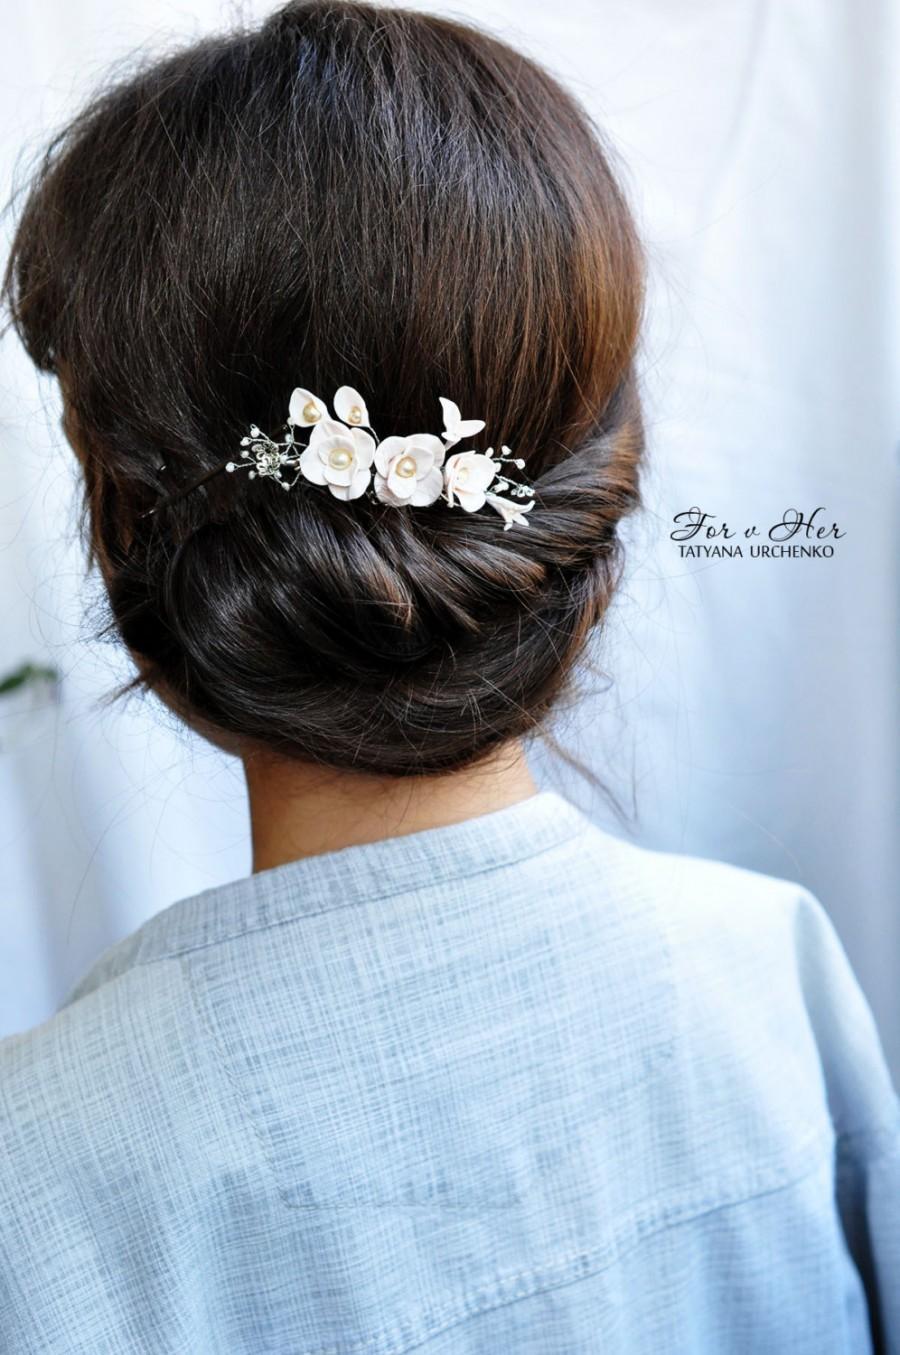 Hochzeit - wedding hair accessory Ivory wedding hairpiece floral headpiece flower hair comb Ivory hair accessory pearl bridal Hair comb Pearl hair comb